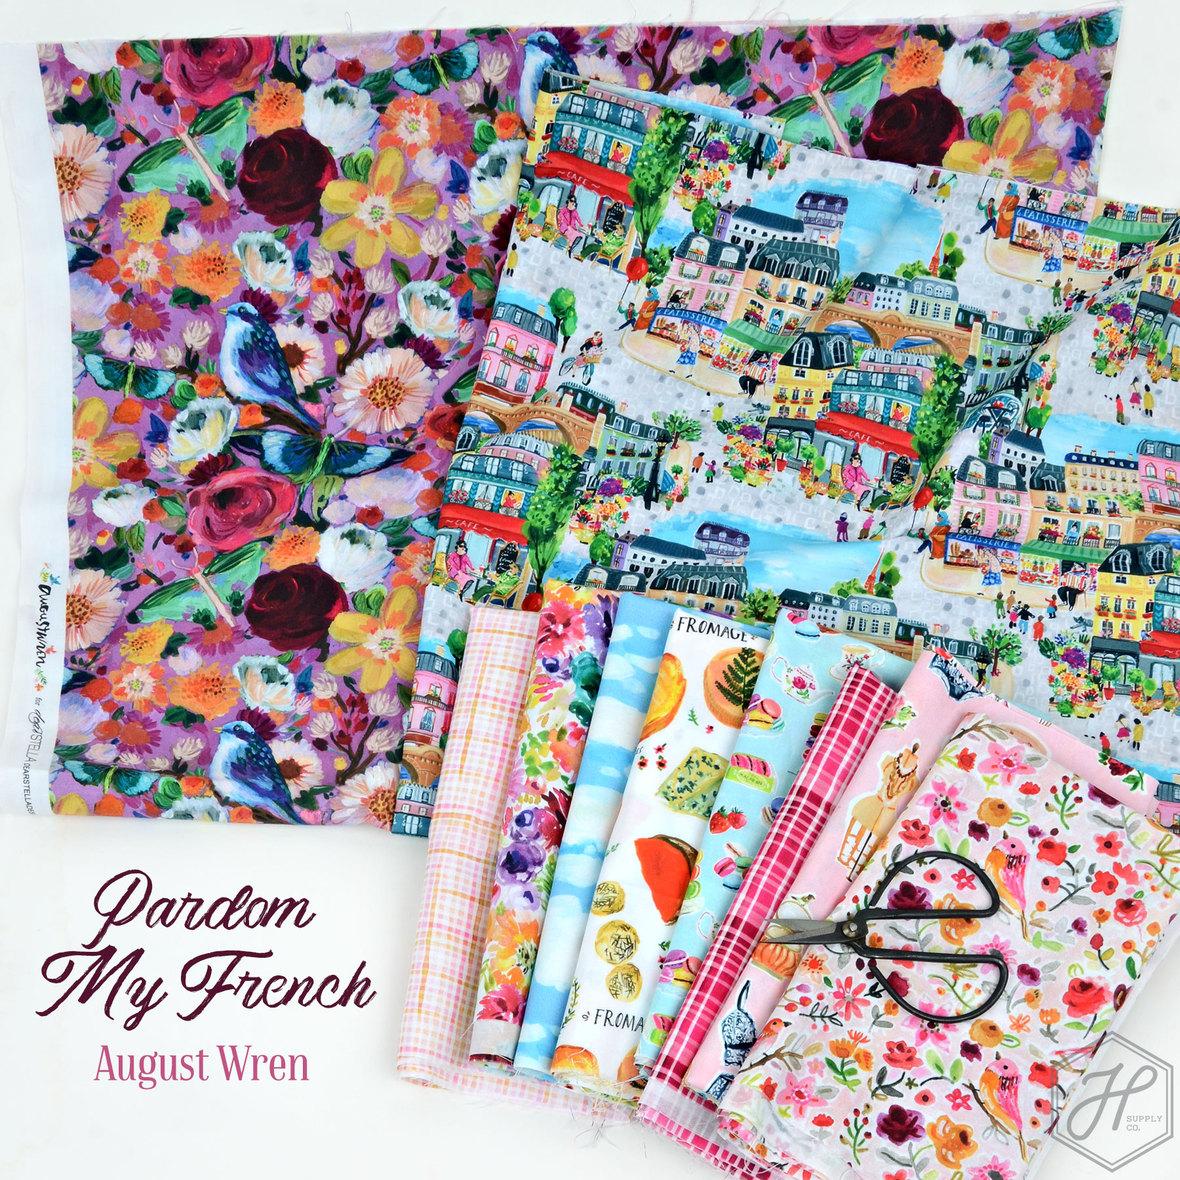 Pardon-my-French-August-Wren-for-Dear-Stella-at-Hawthorne-Supply-Co